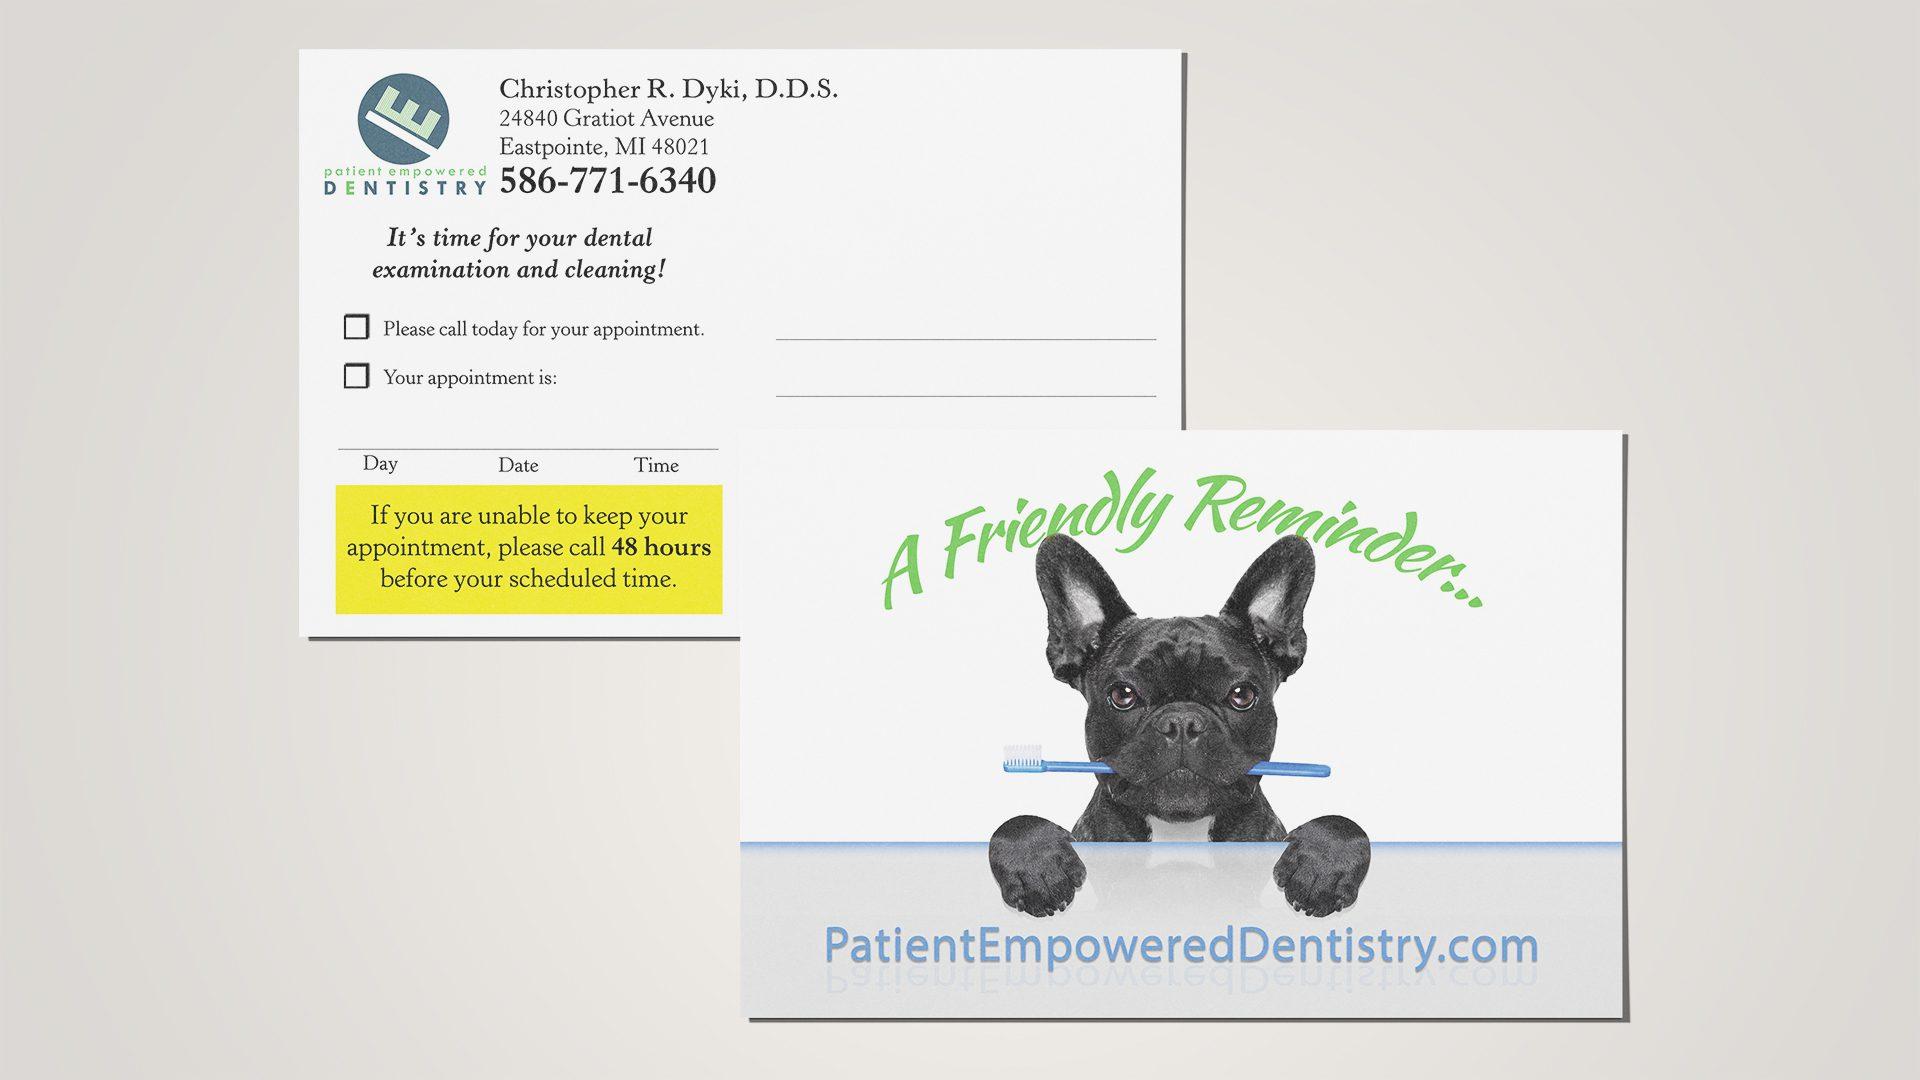 Patient Empowered Dentistry - Reminder Postcard Mockup 01